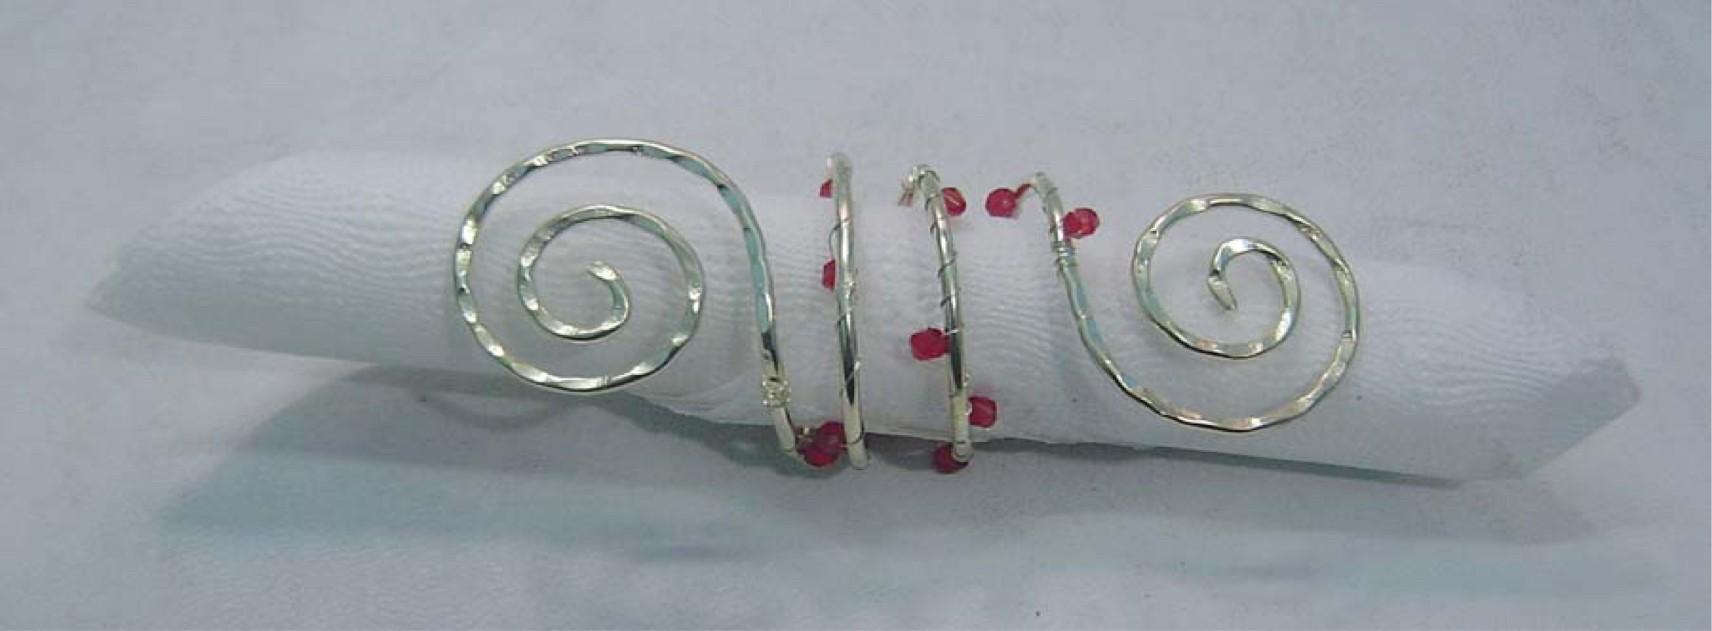 Decorative Brass Napkin Ring